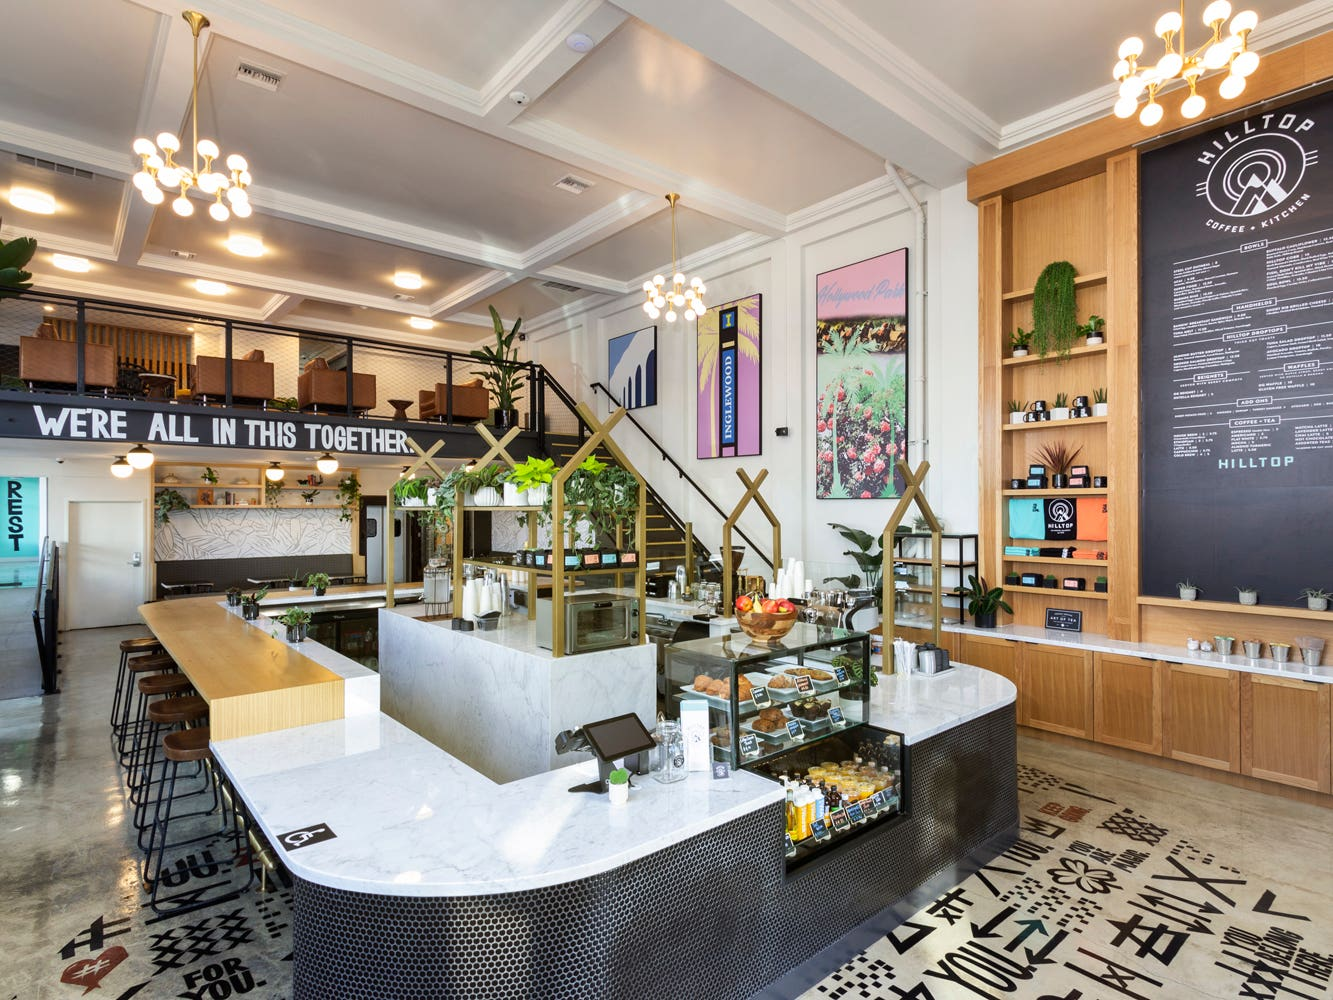 Interior of Hilltop Coffee + Kitchen in Inglewood